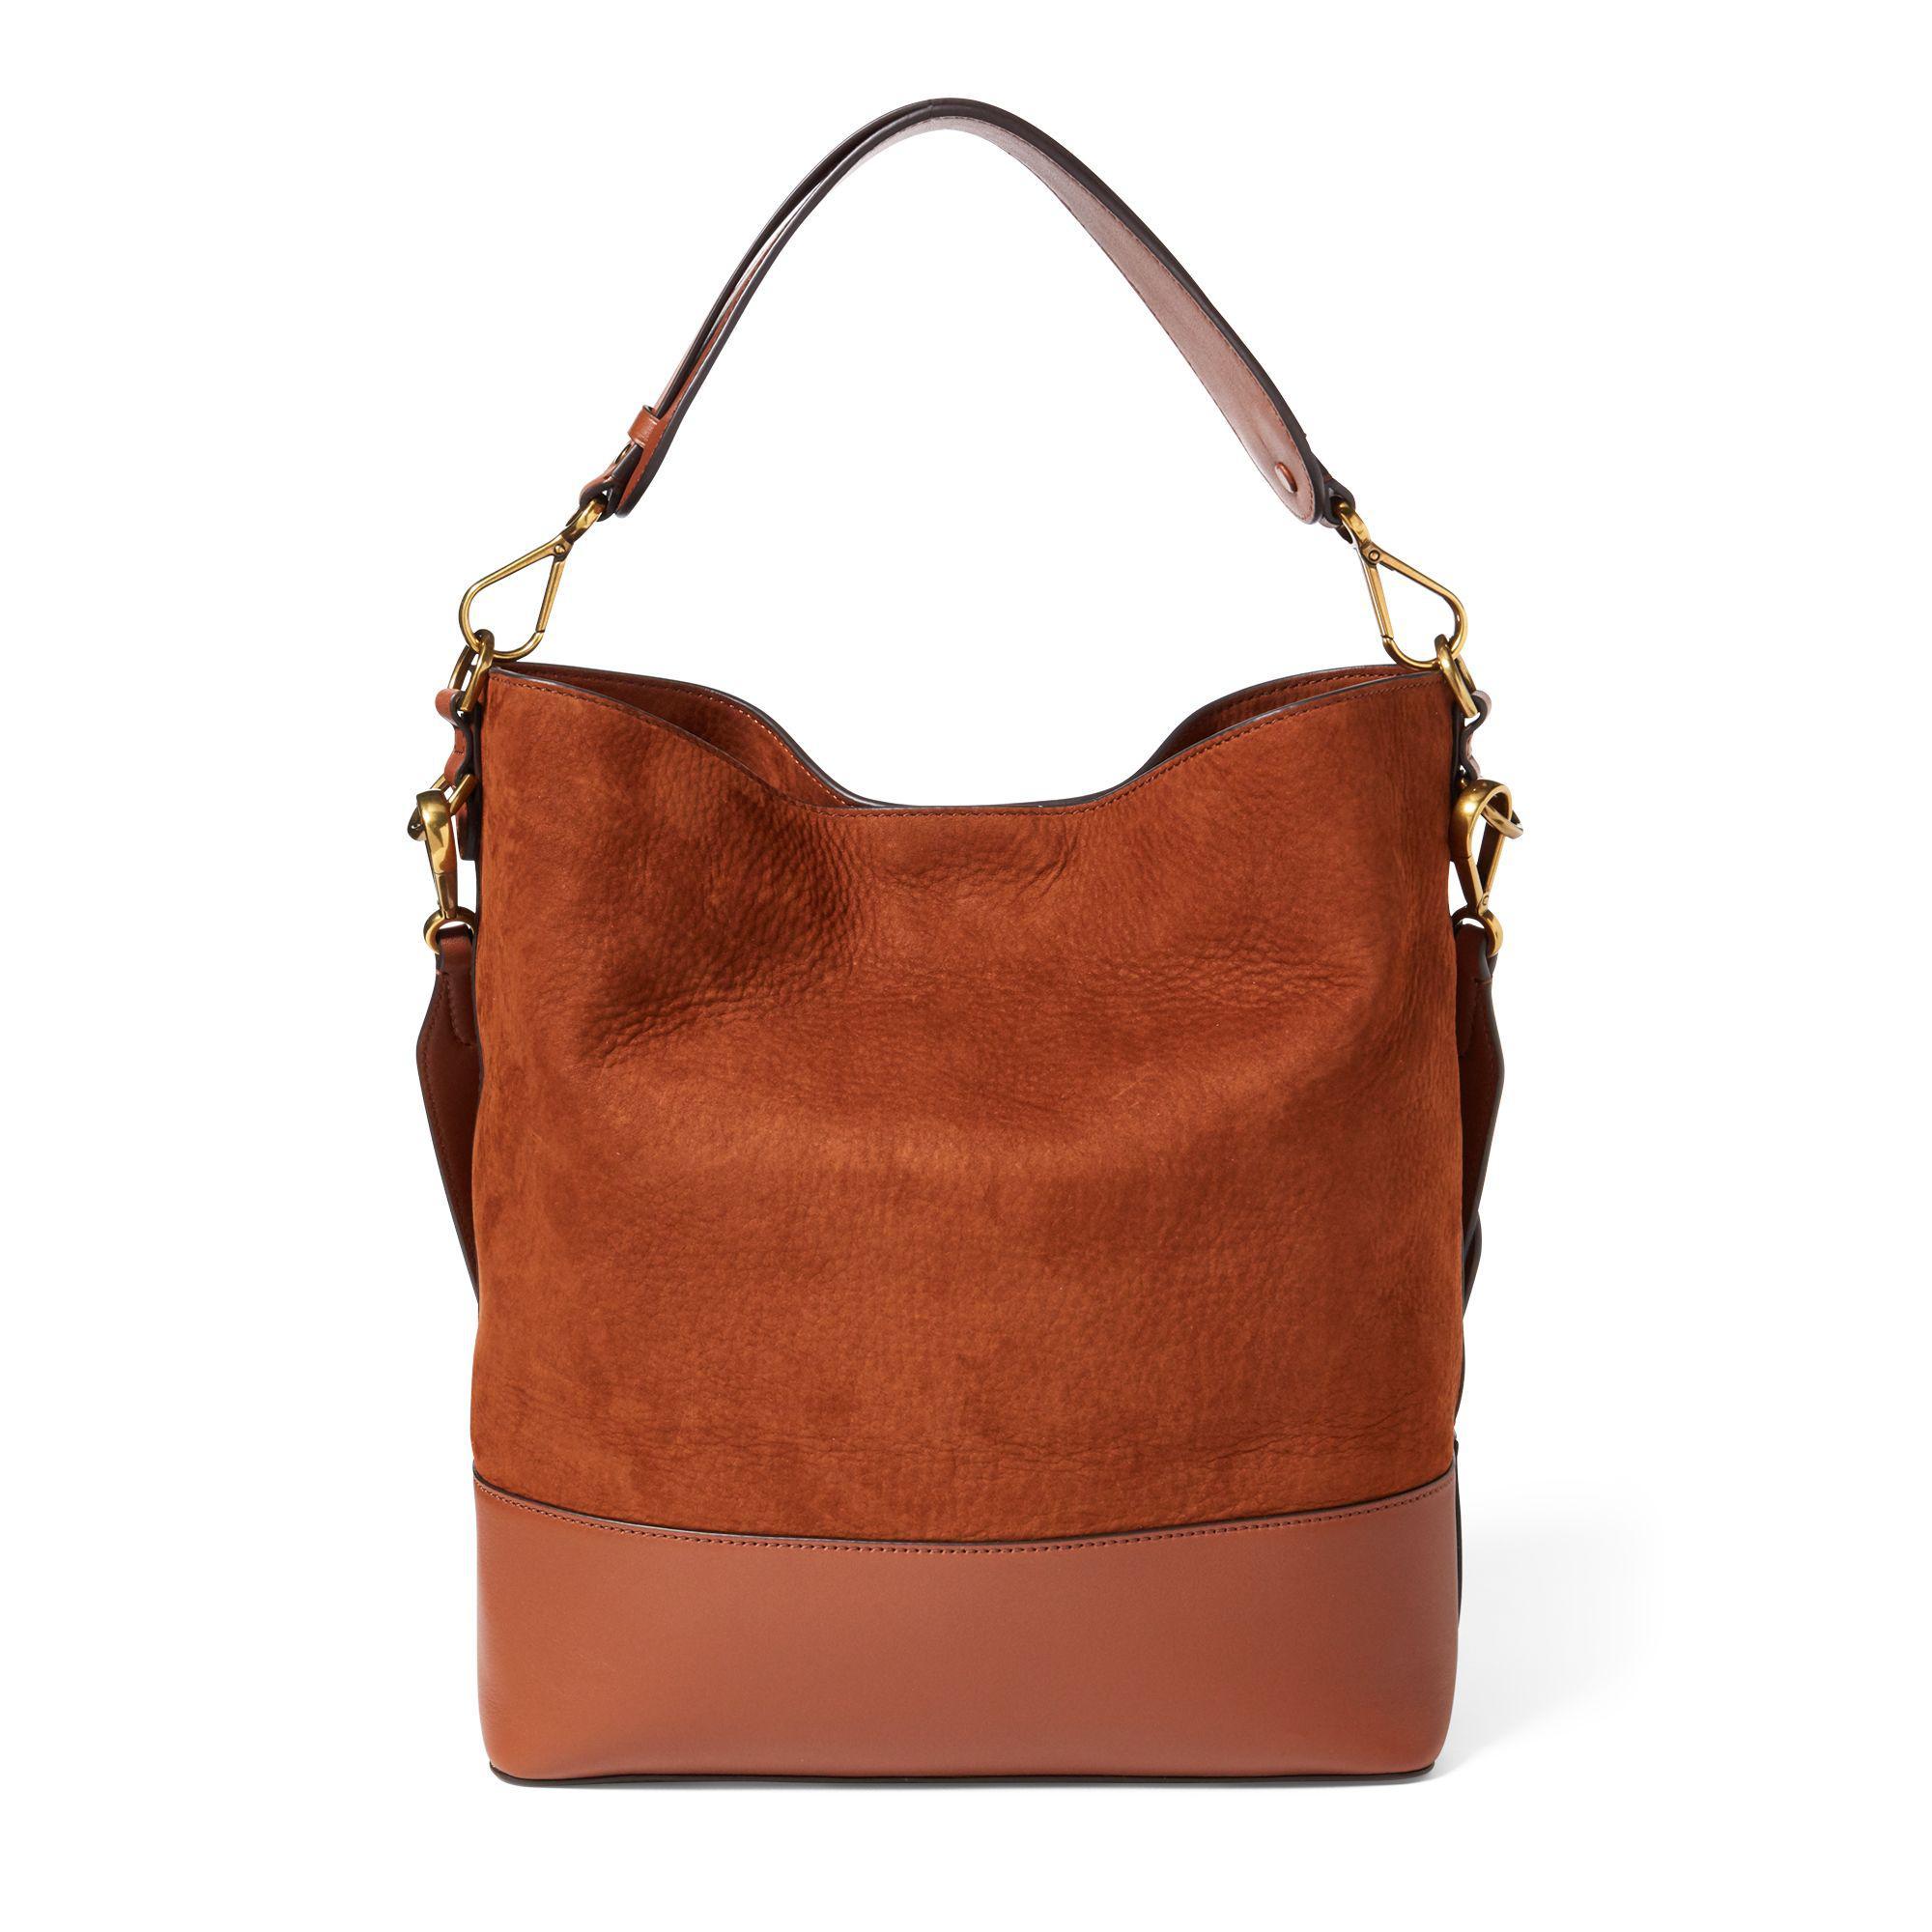 7fe396b292b6 Lyst - Polo Ralph Lauren Nubuck Leather Hobo Bag in Brown